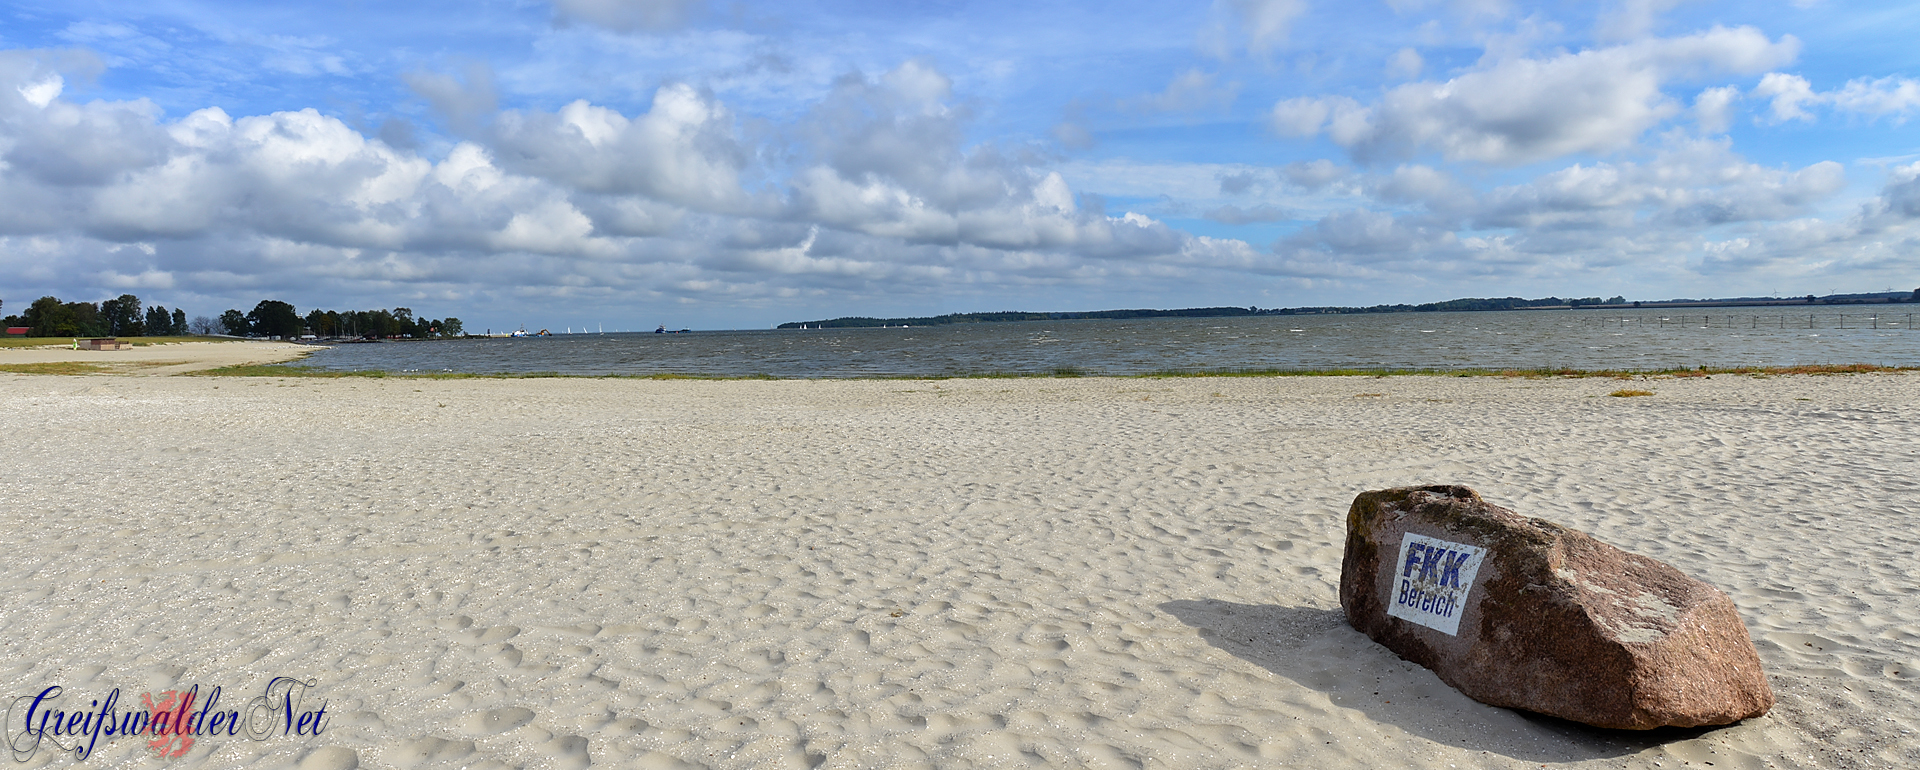 Strandbad Greifswald-Eldena